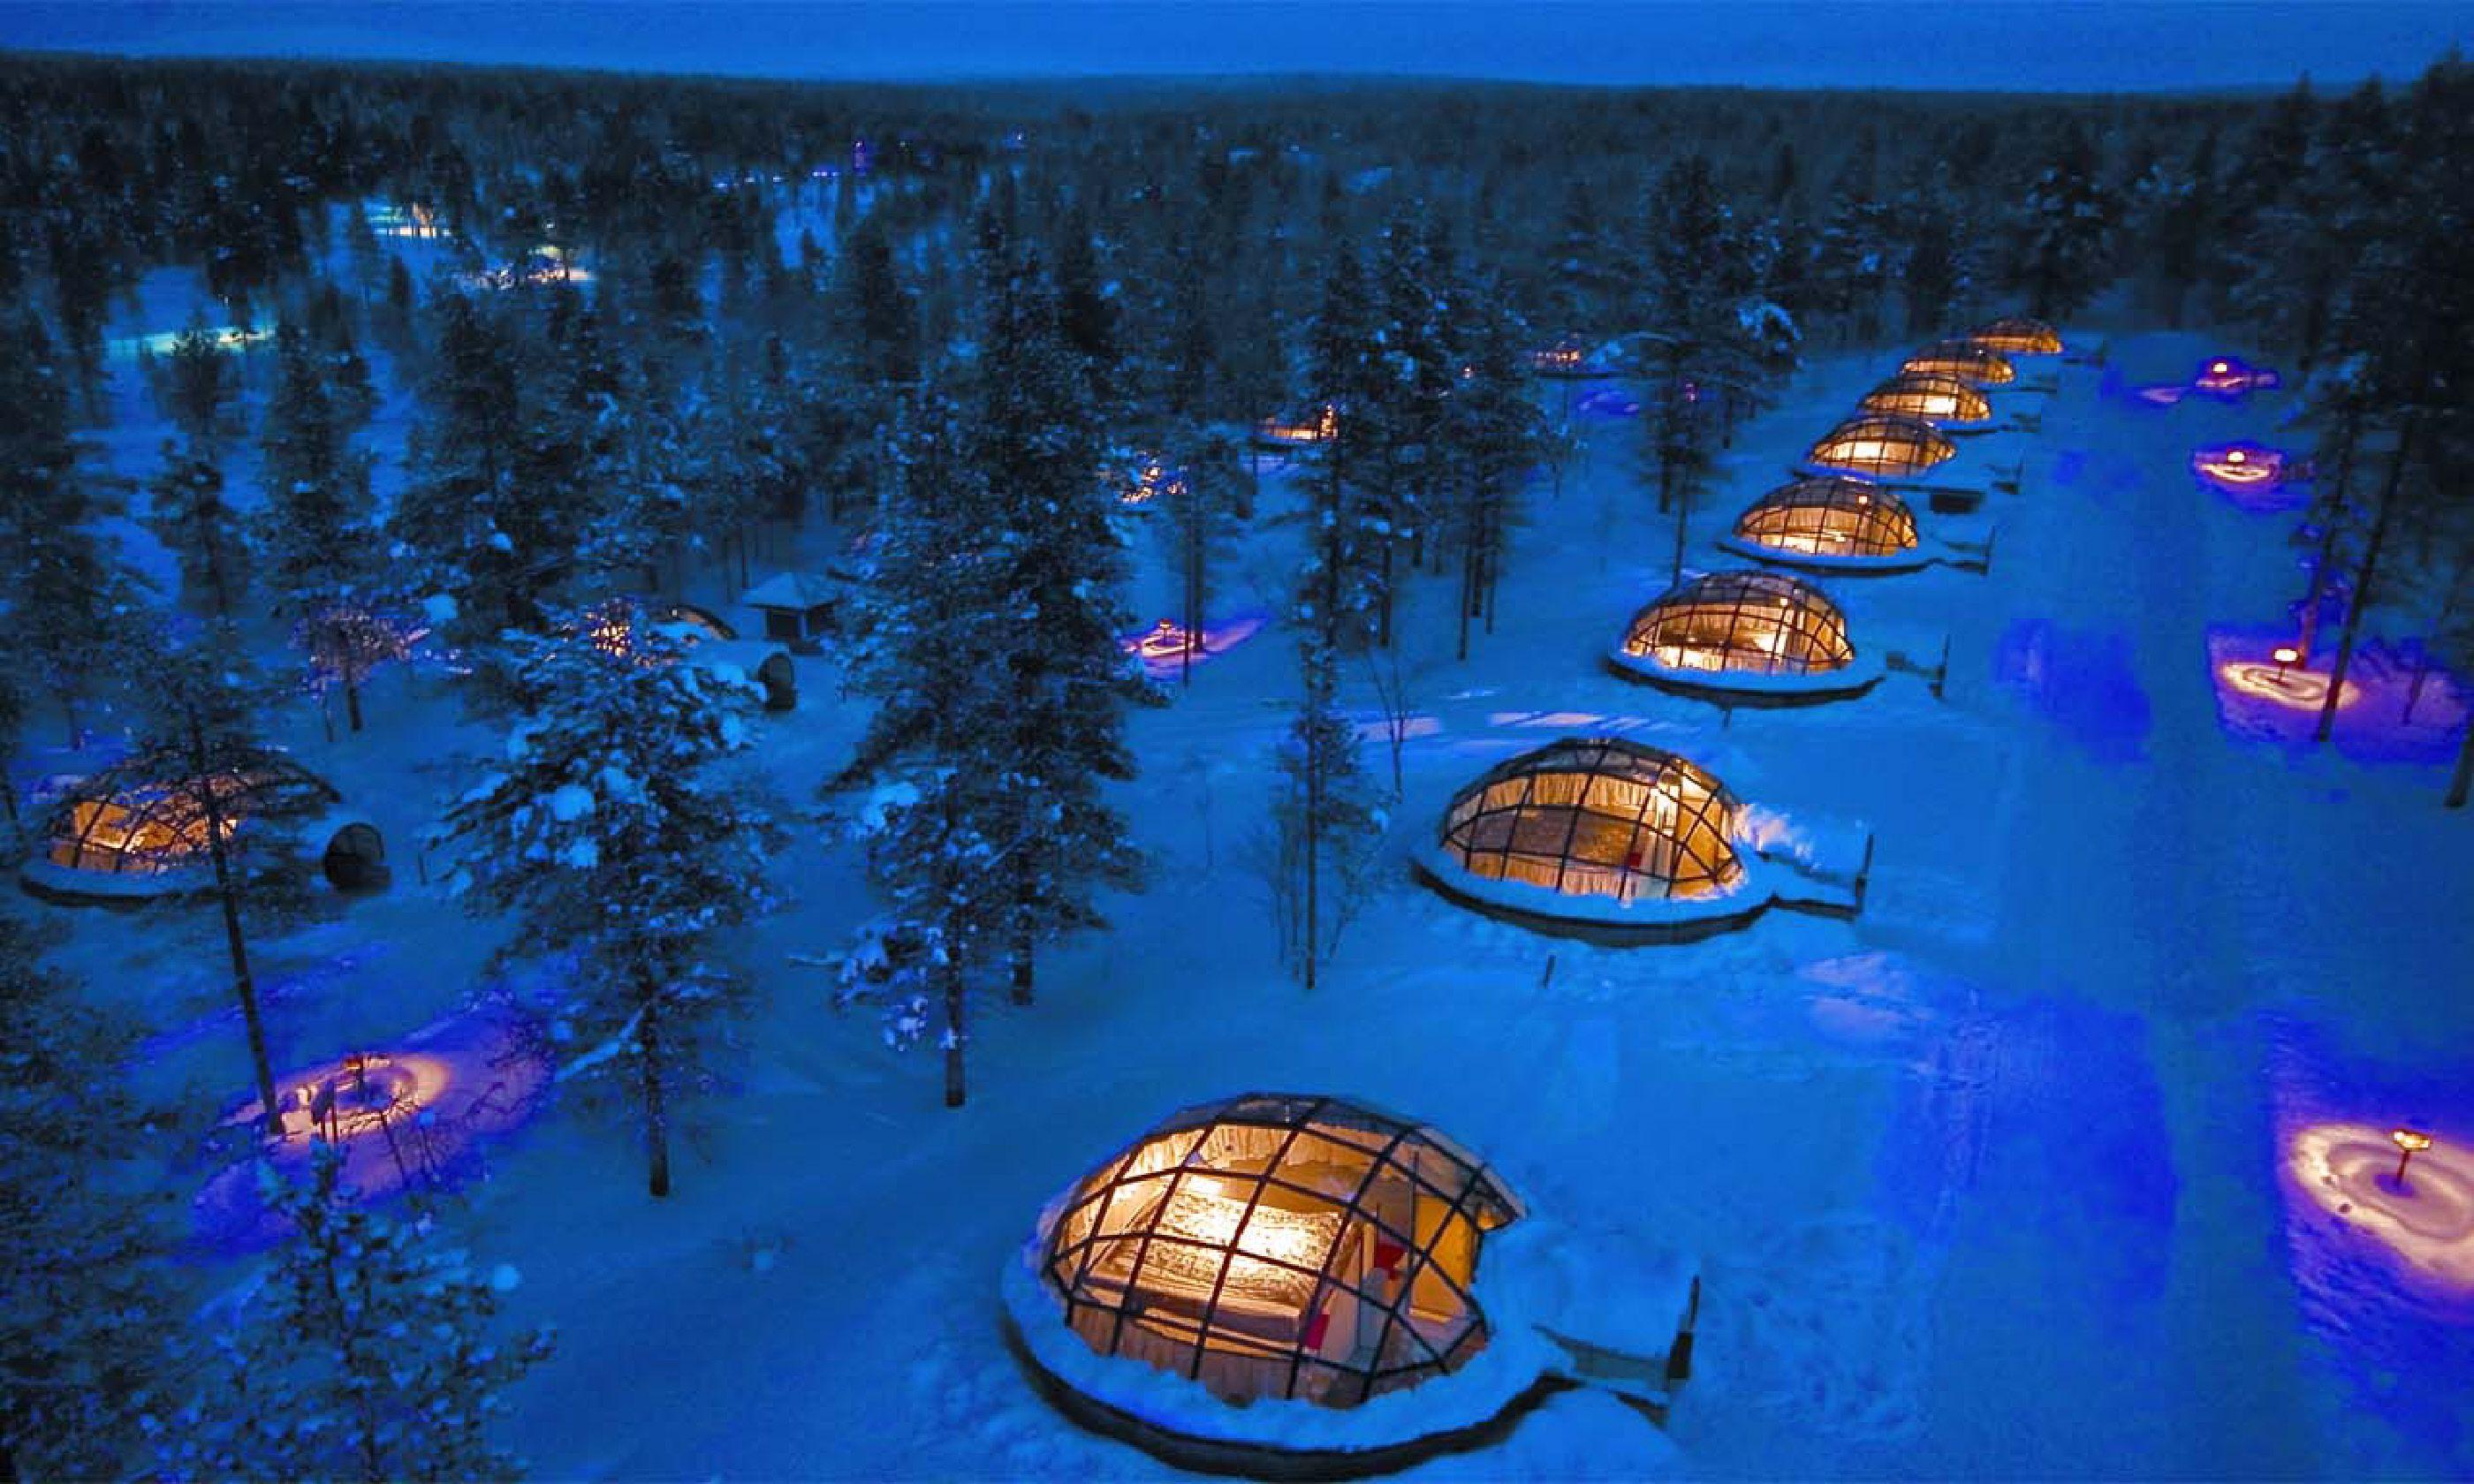 Glass Igloos of Hotel Kakslauttanen (kakslauttanen.fi)